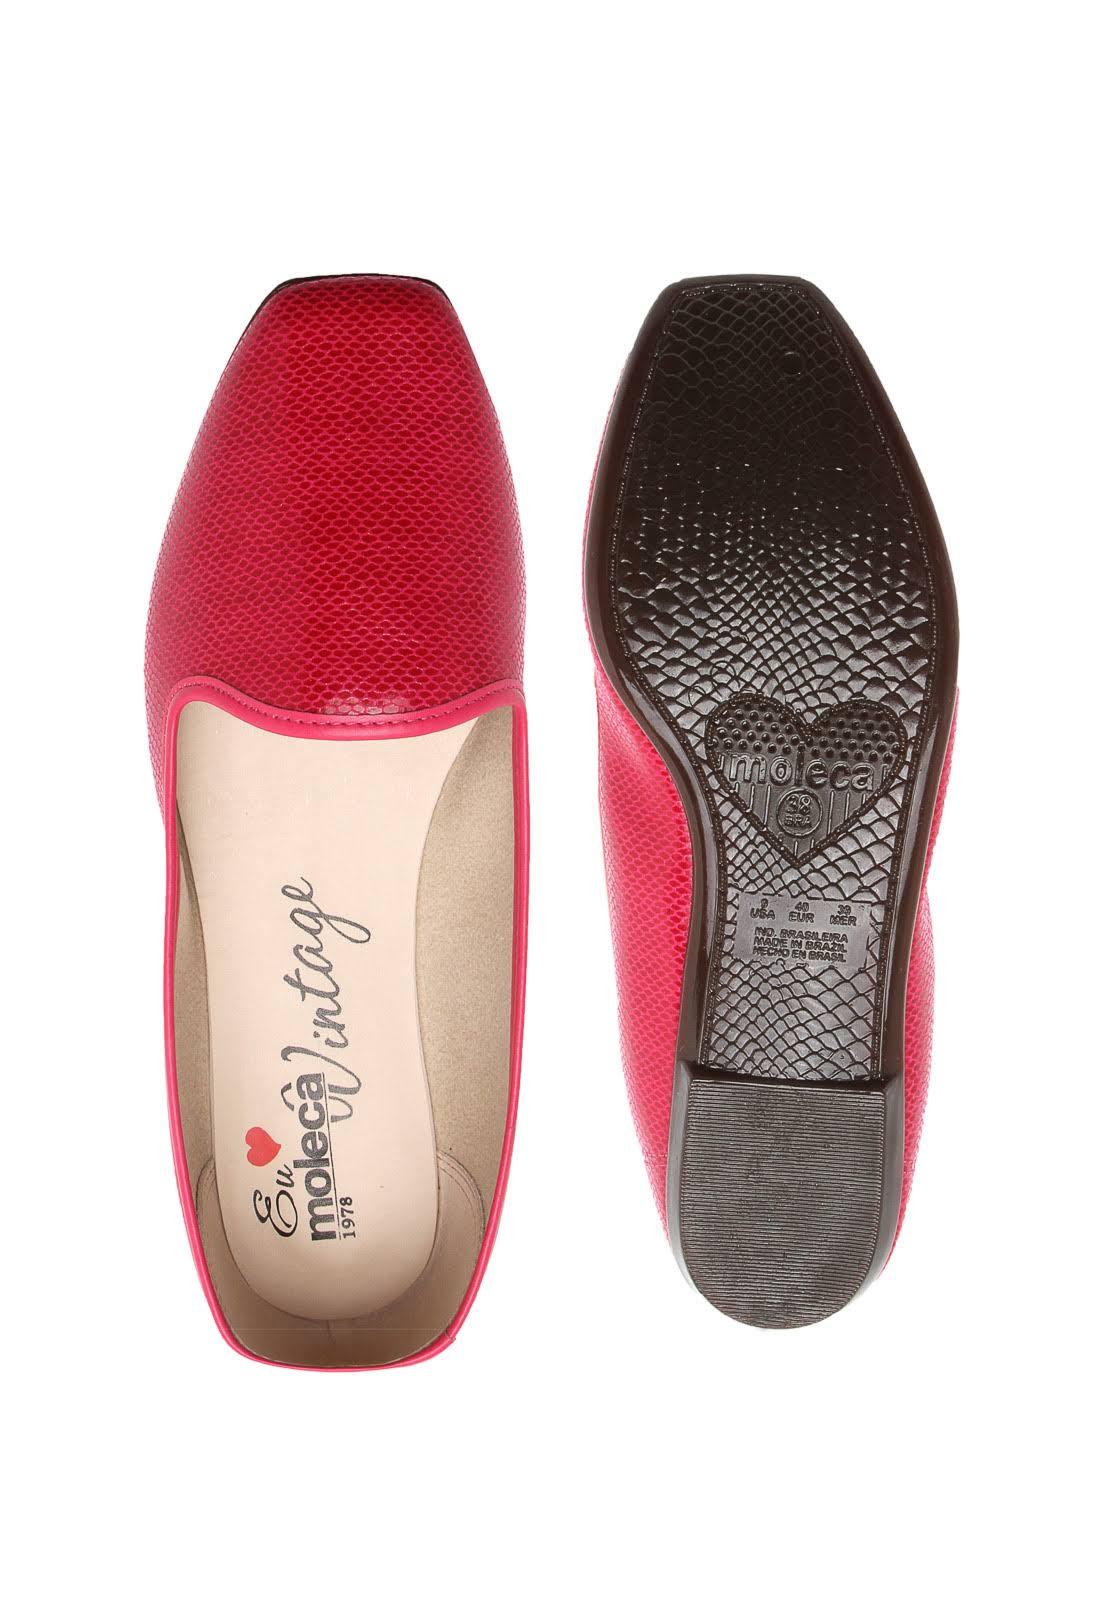 Sneaker Pink Cutout Pink Cutout Moleca Sneaker Moleca Moleca Sneaker Pink Cutout Sneaker Pink Moleca 5ARjL34Scq